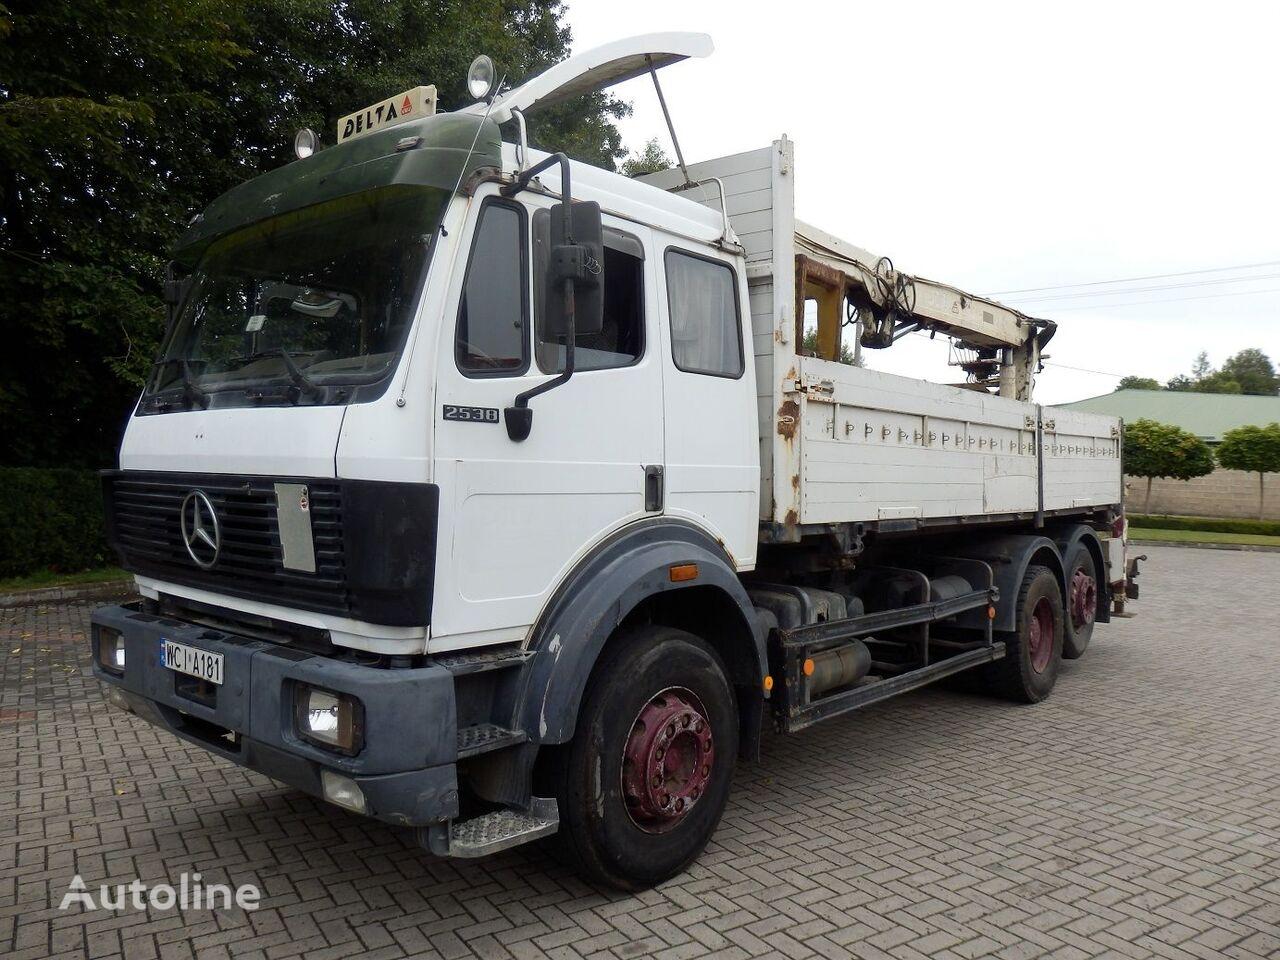 MERCEDES-BENZ SK 2538 6x2 Engine V8 13.t Axles  bortu kravas automašīna